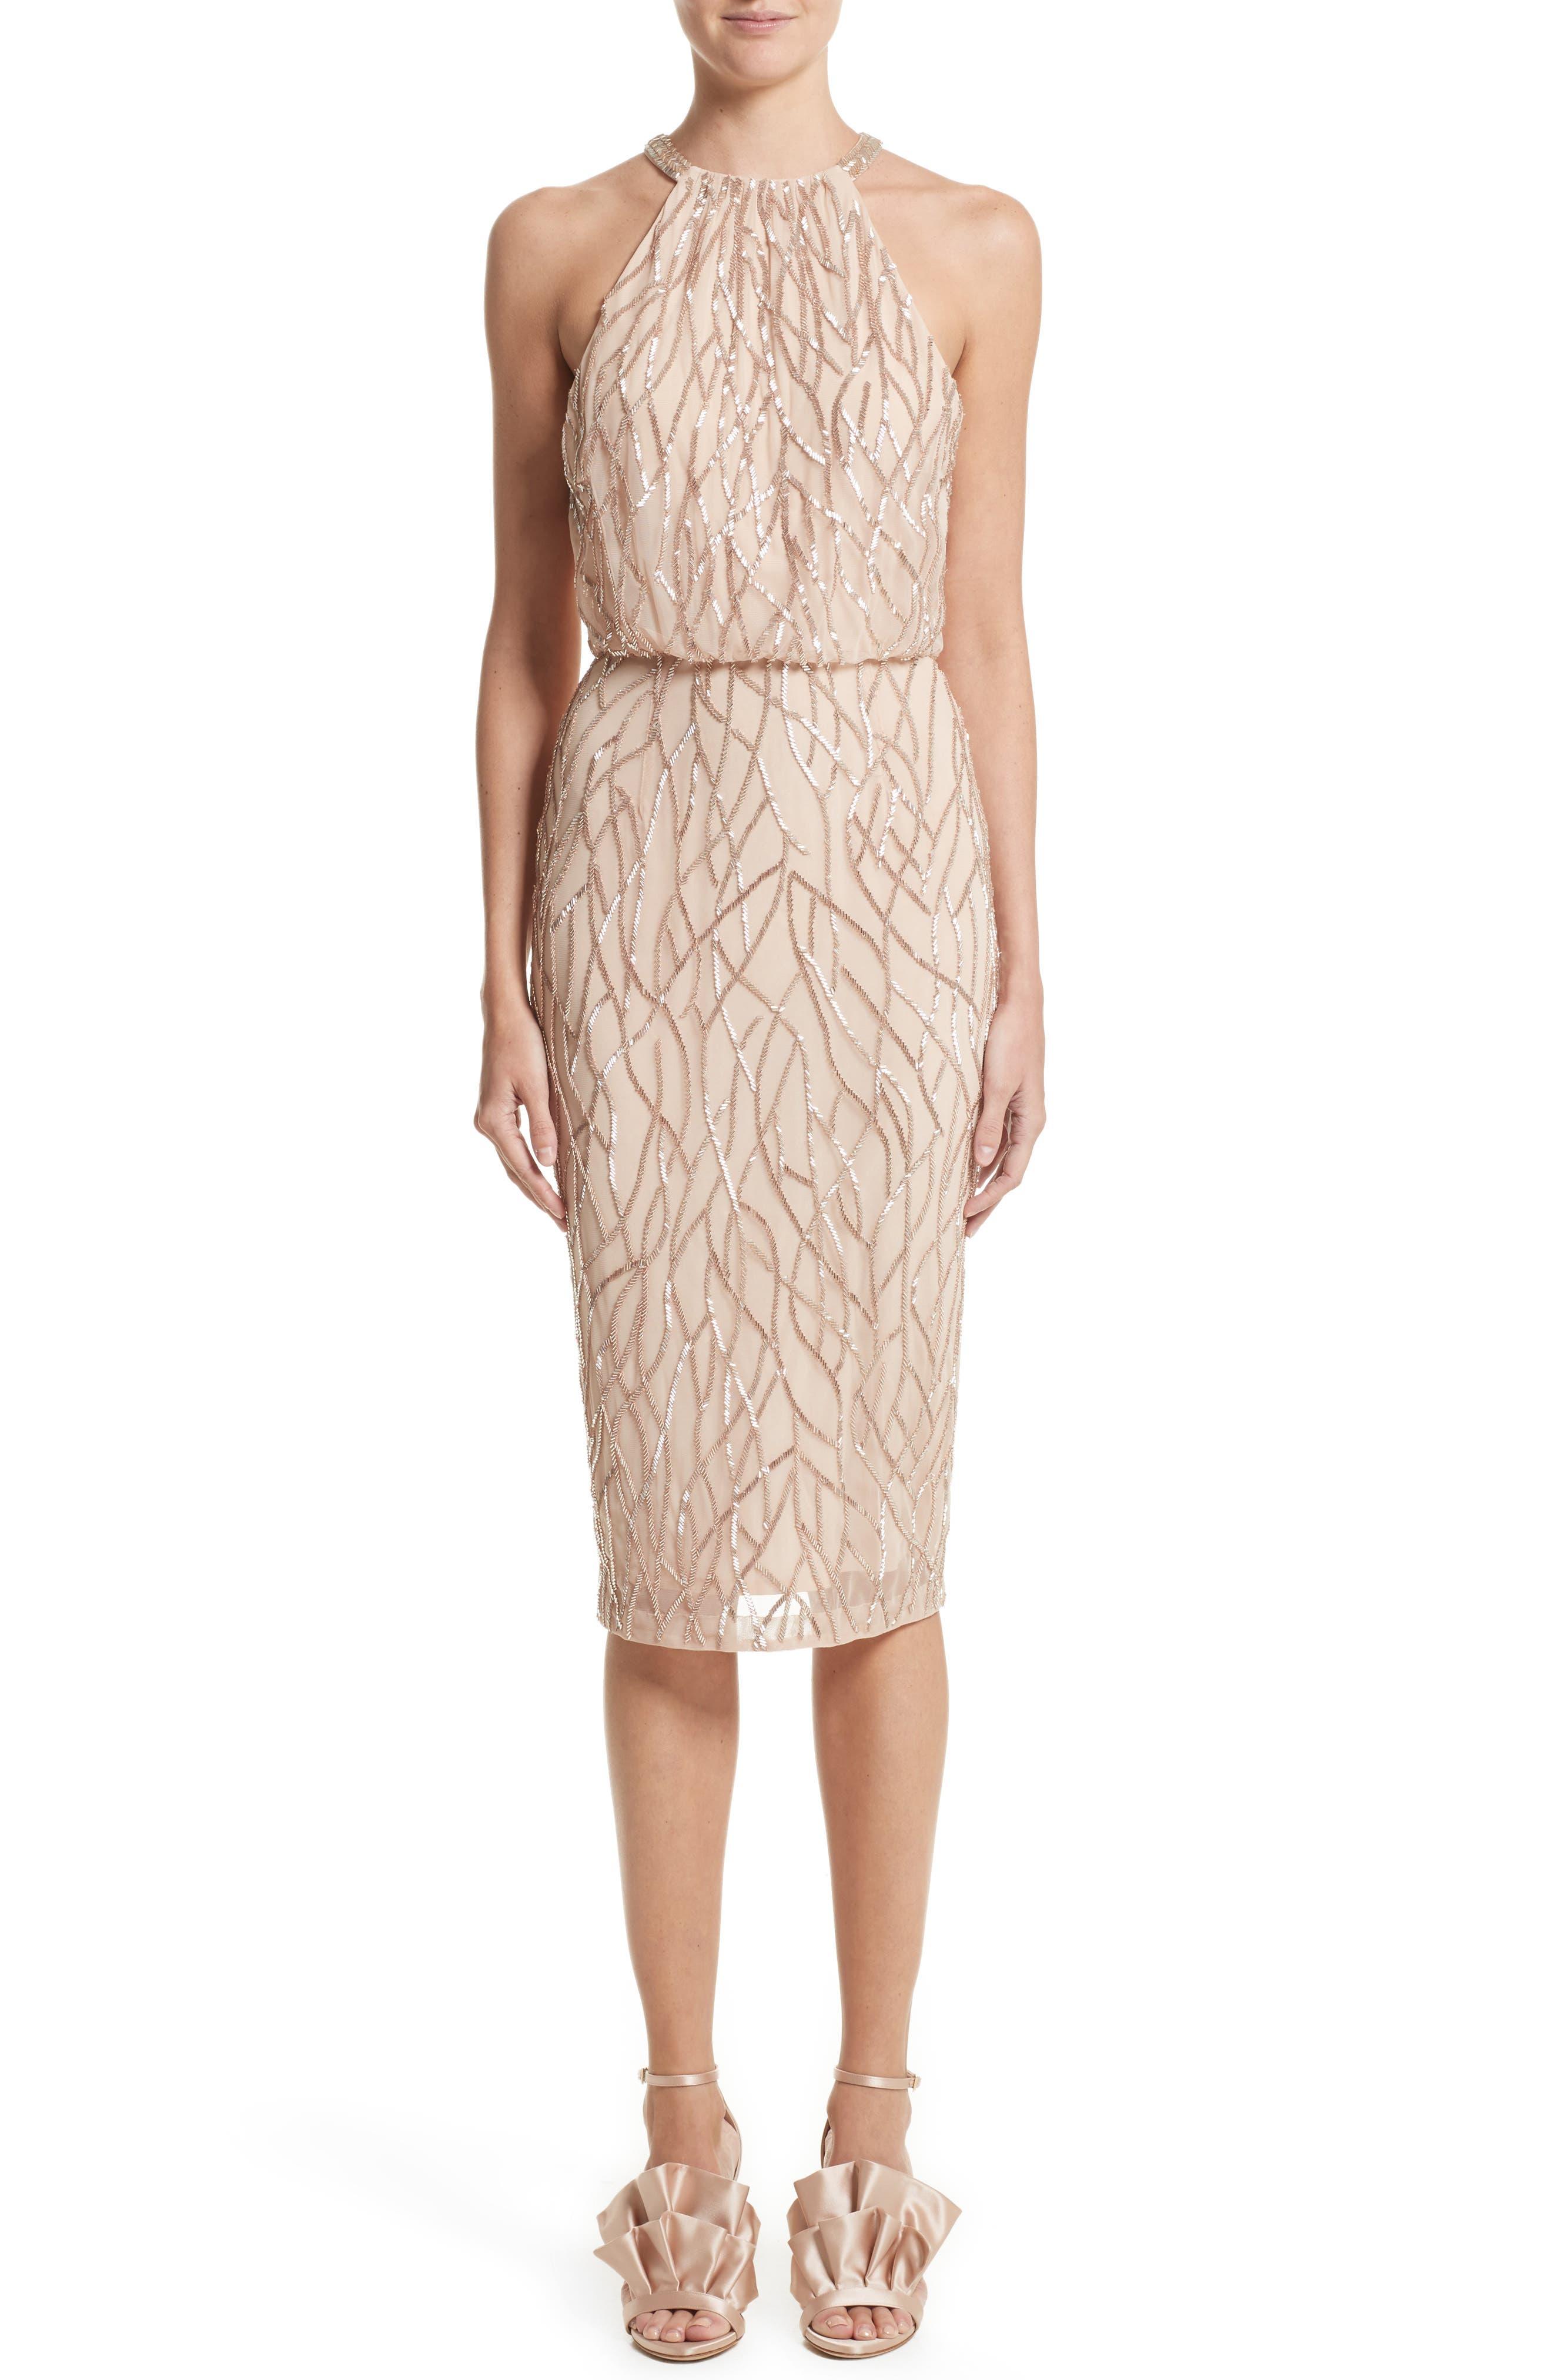 RACHEL GILBERT Toriana Beaded Halter Style Sheath Dress